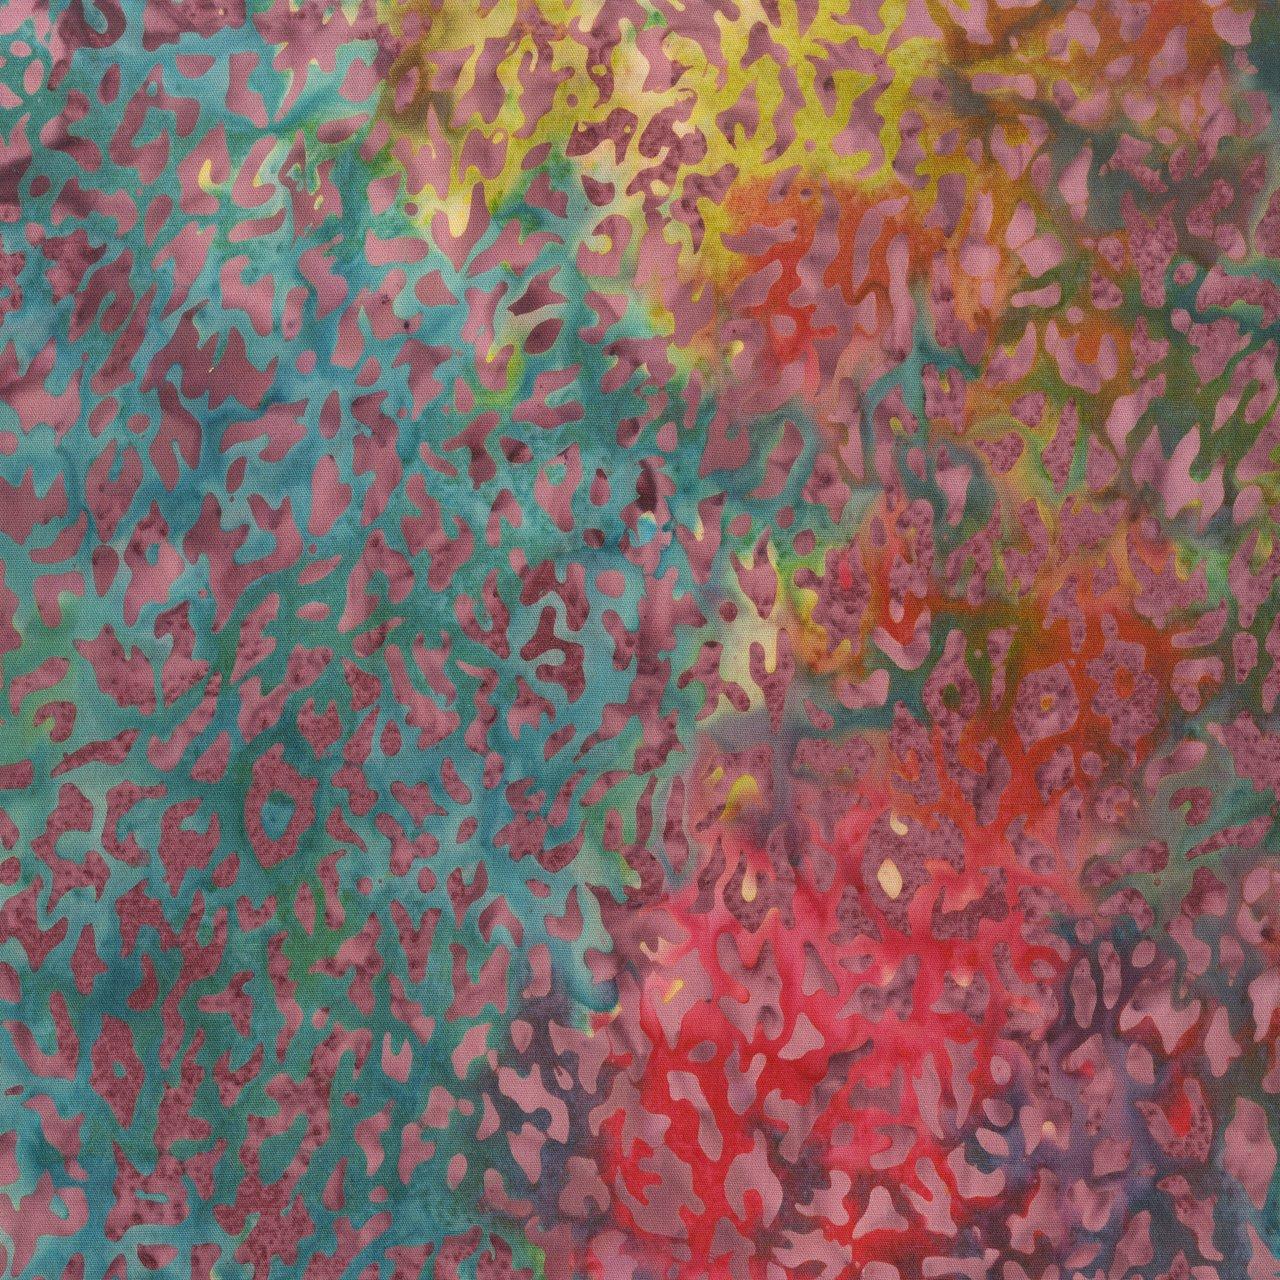 228 Q 5 RAINBOW  ART INSPIRED  SEA BATTLE BY ANTHOLOGY FABRICS